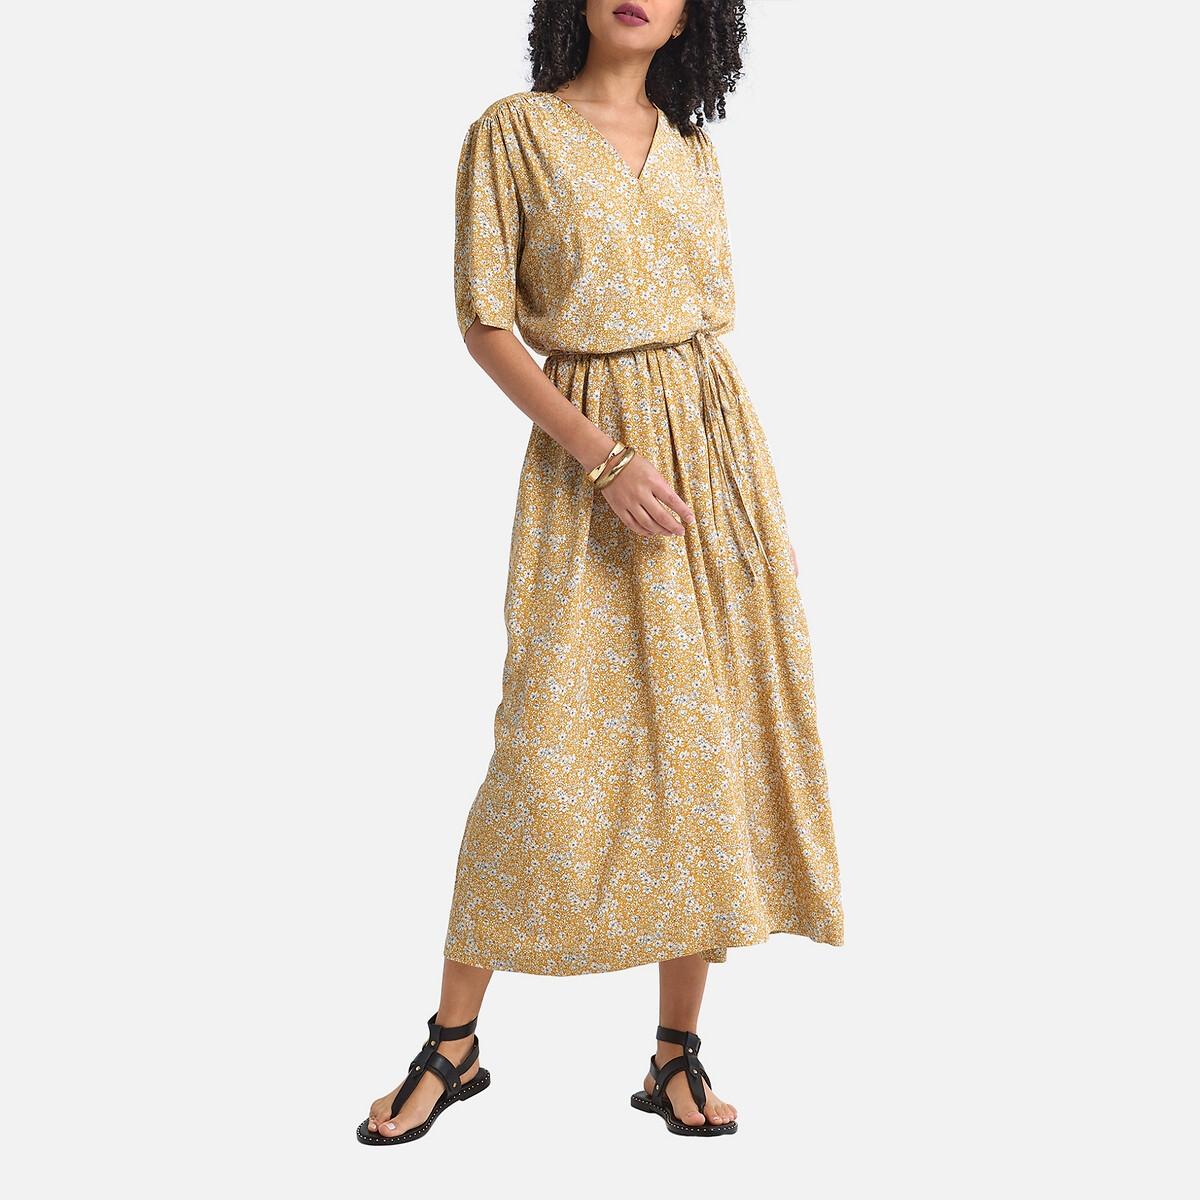 Платье La Redoute С запахом короткими рукавами с принтом 42 (FR) - 48 (RUS) желтый платье la redoute длинное с запахом с короткими рукавами 34 fr 40 rus черный